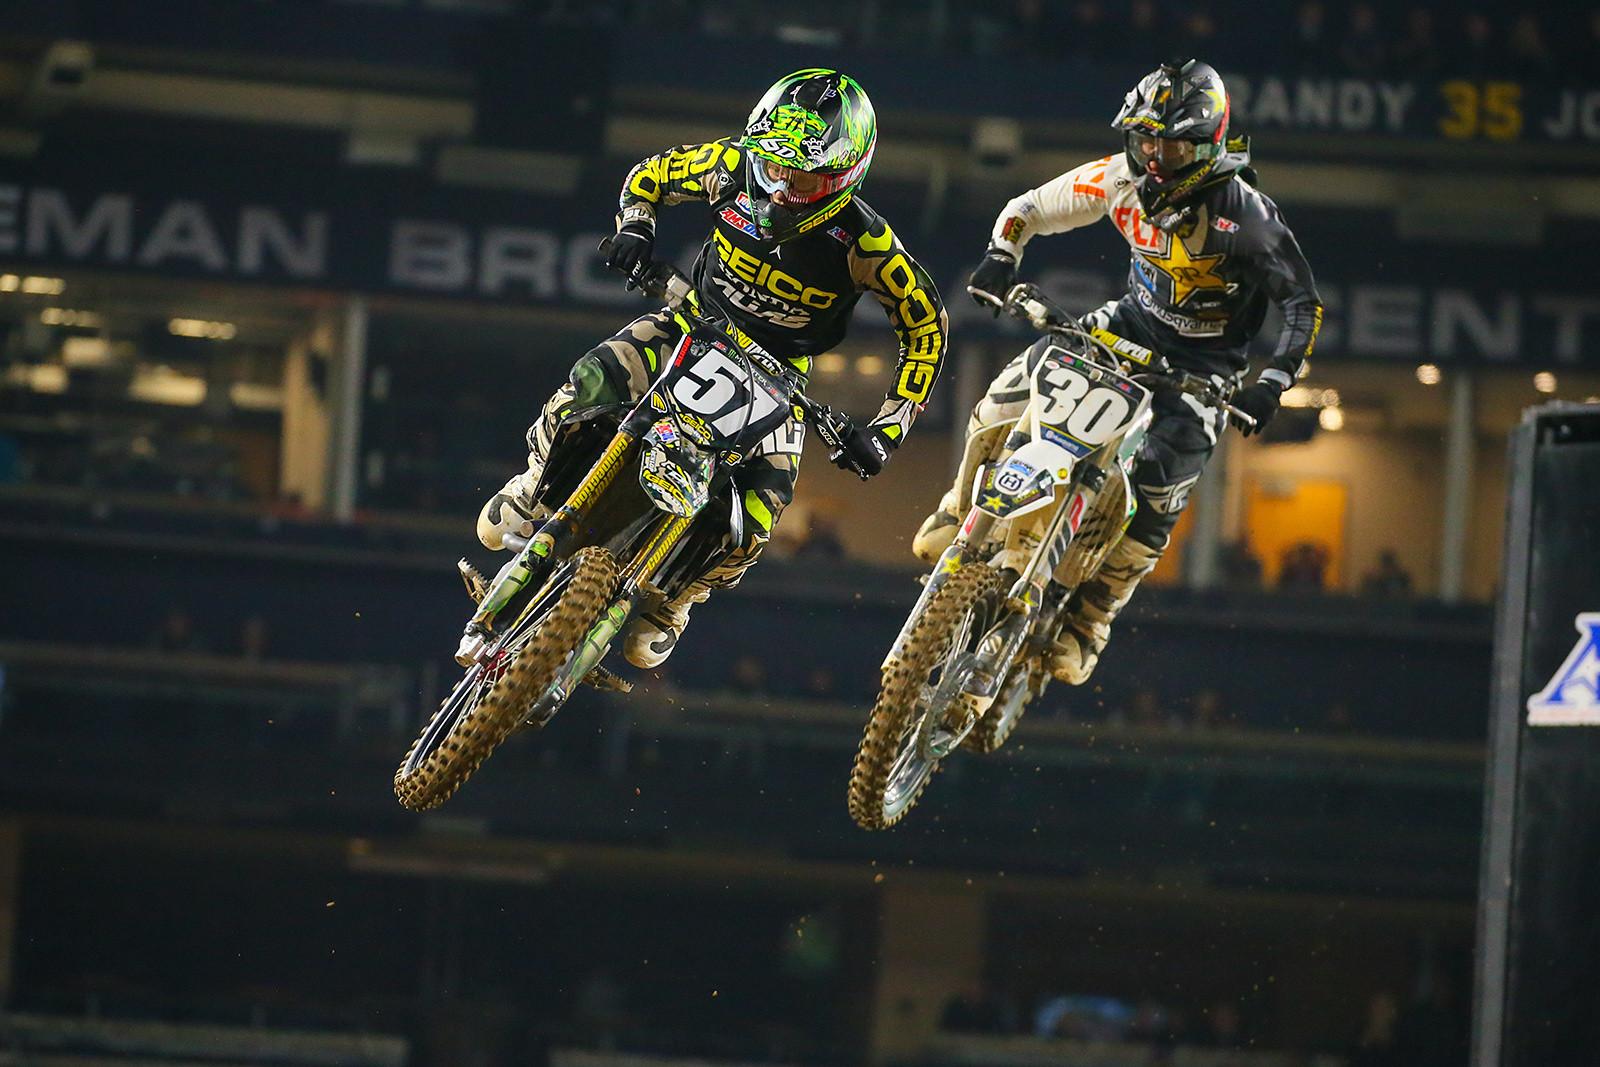 Jimmy DeCotis and Martin Davalos - Photo Blast: San Diego - Motocross Pictures - Vital MX